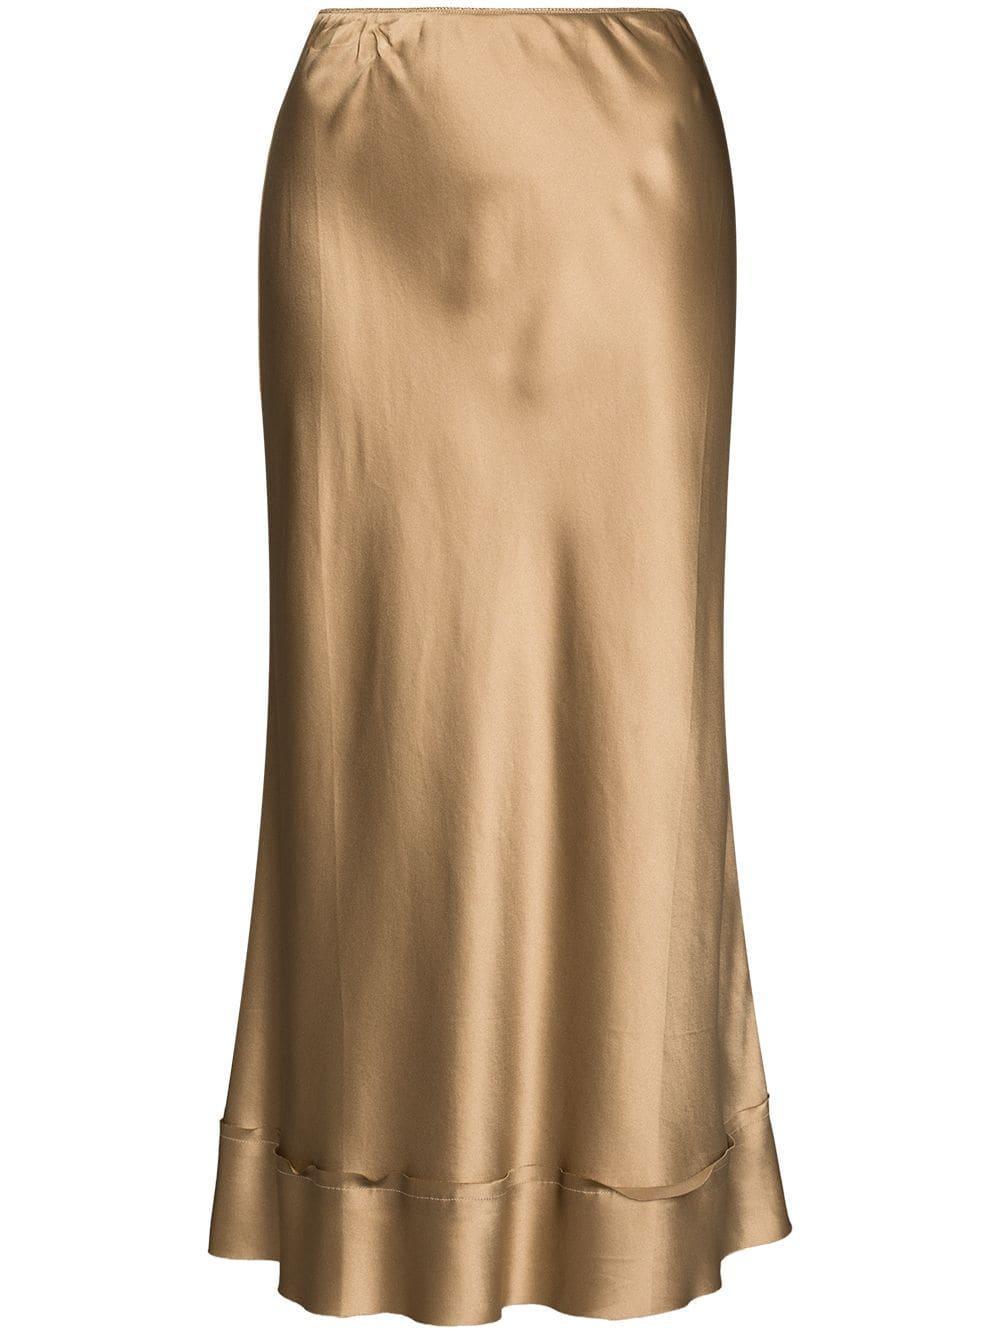 Stella Silk Satin Skirt Item # M2103SK404